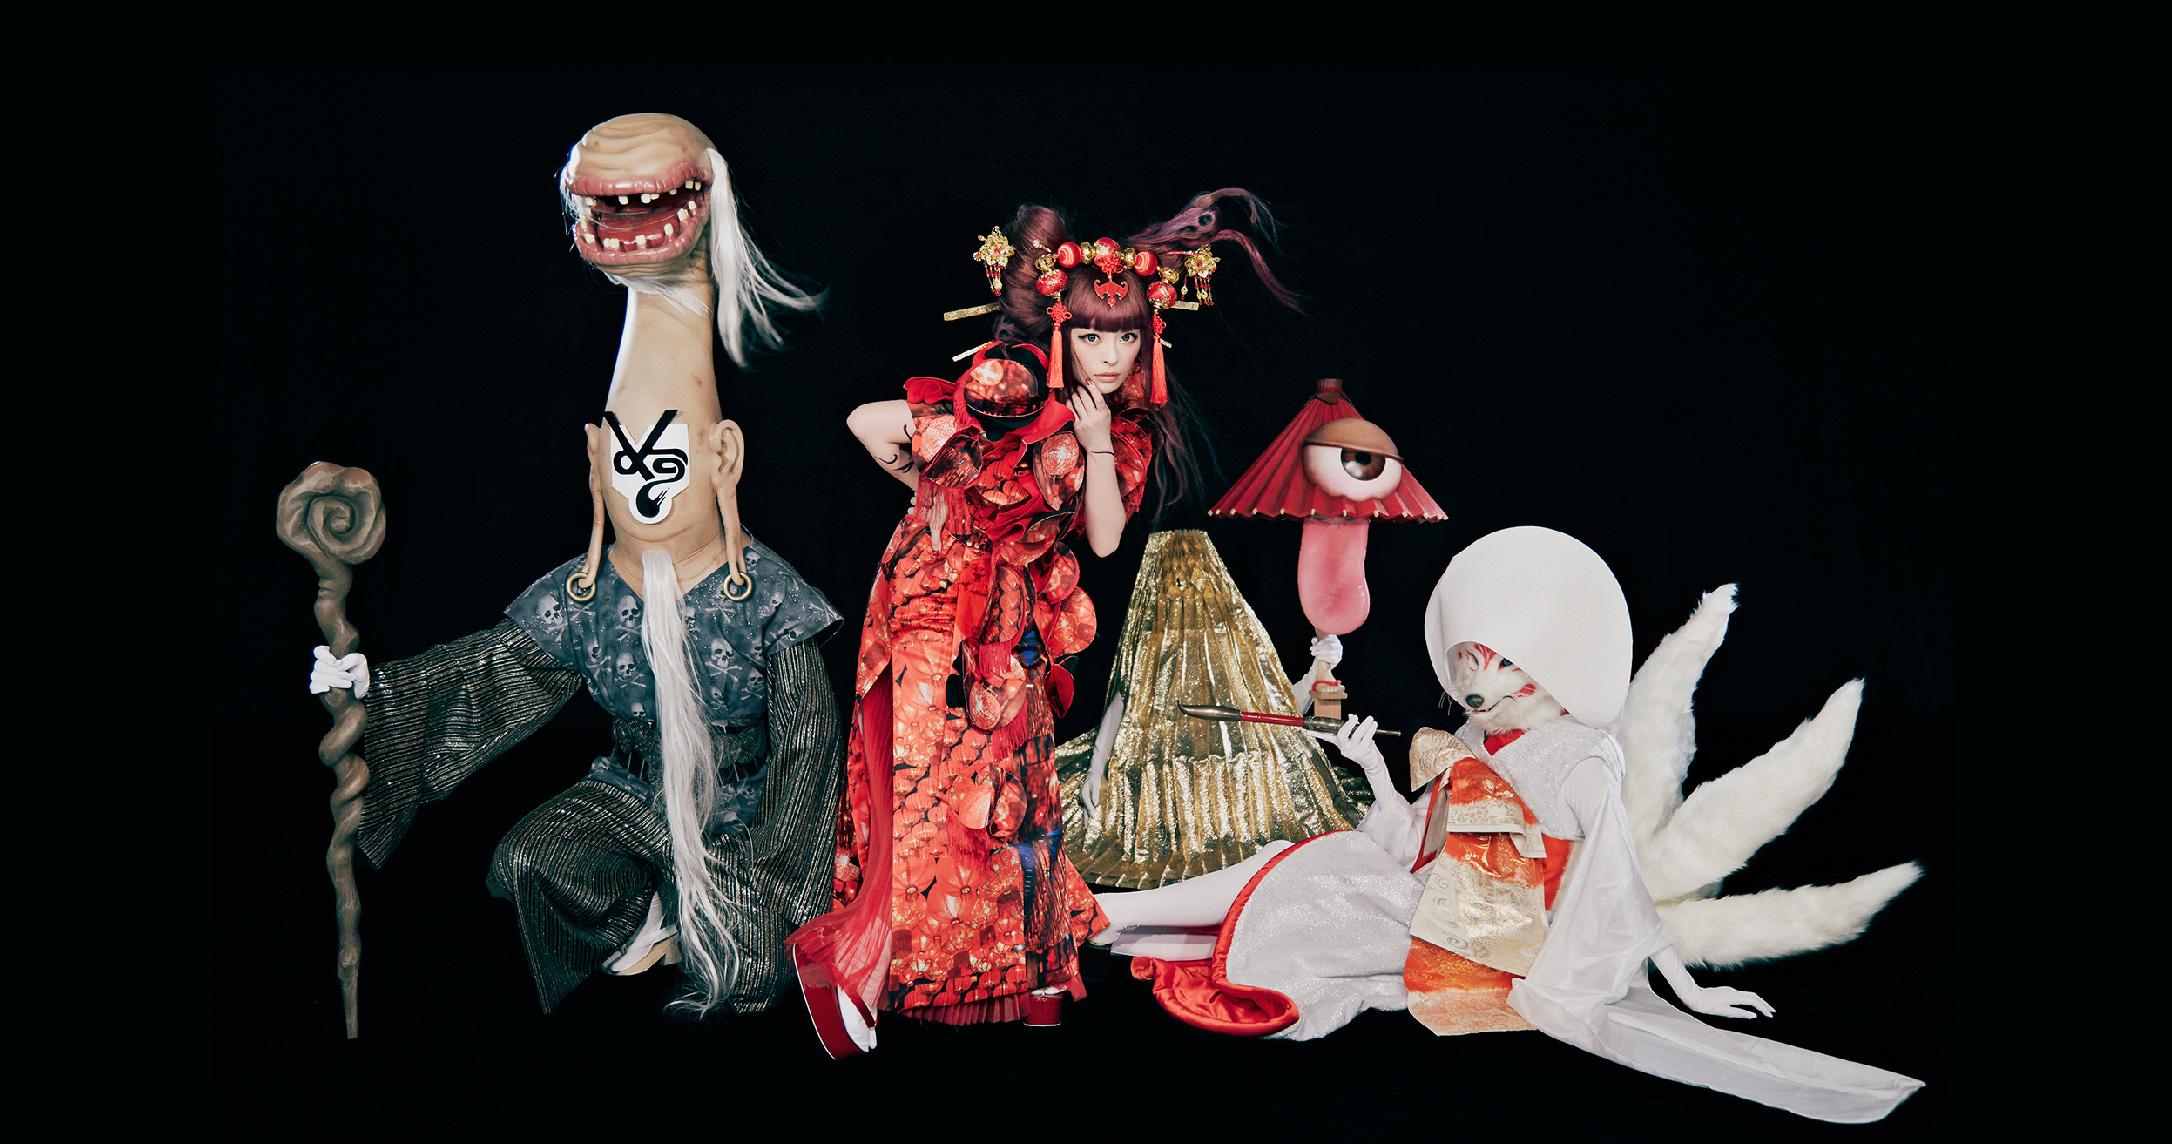 NekoPOP-Kyary-Pamyu-Pamyu-The-Spooky-Obakeyashiki-USA-tour-1